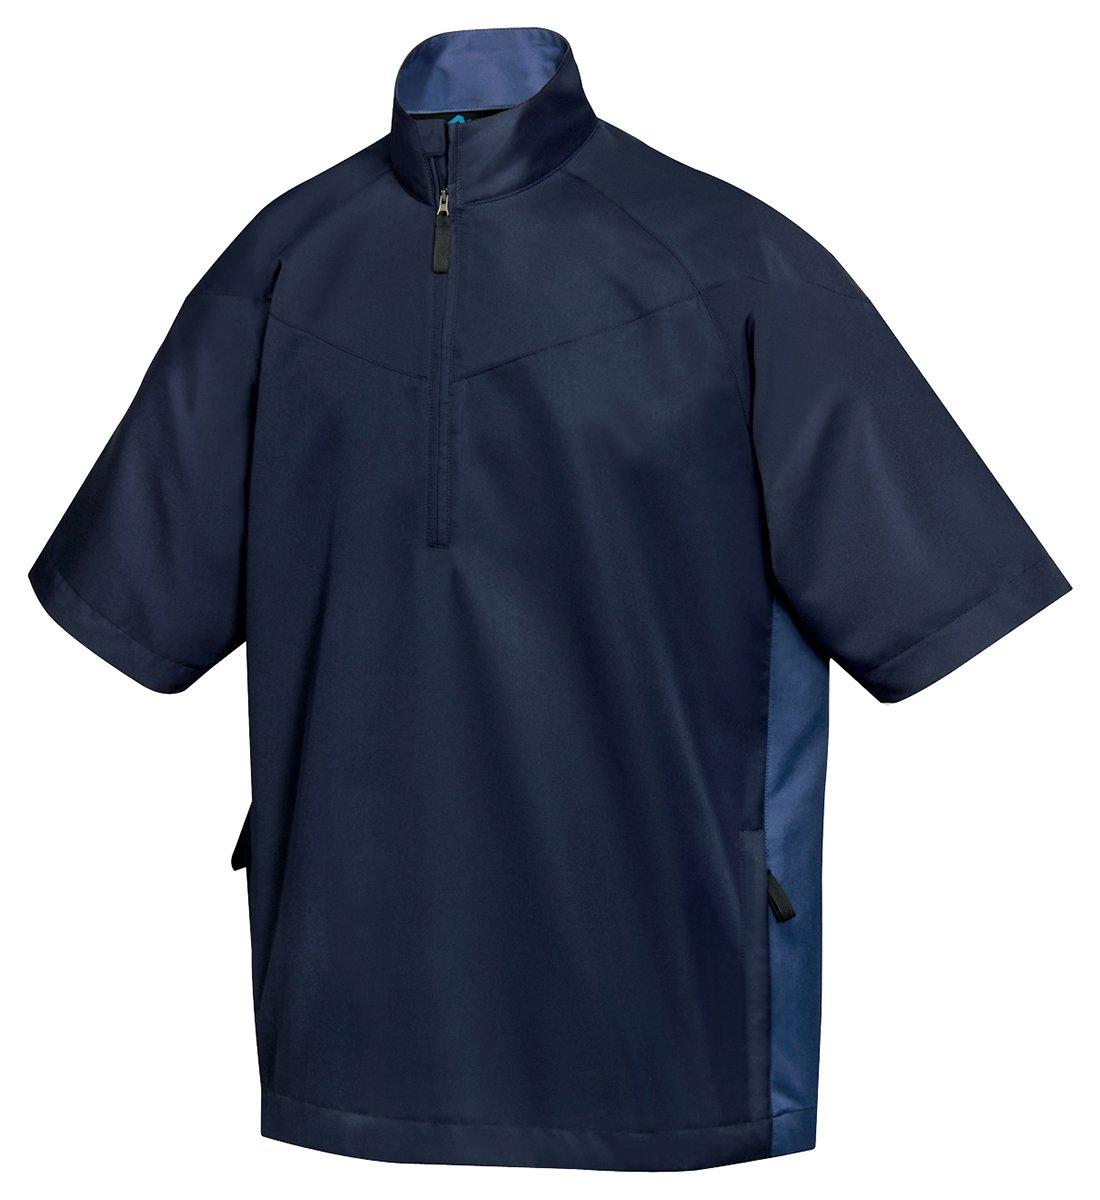 Tri-Mountain All Season Half Zip Short Sleeve Windshirt - 2610 Icon, NAVY/MOUNTAIN BLUE, X-Large by Tri-Mountain